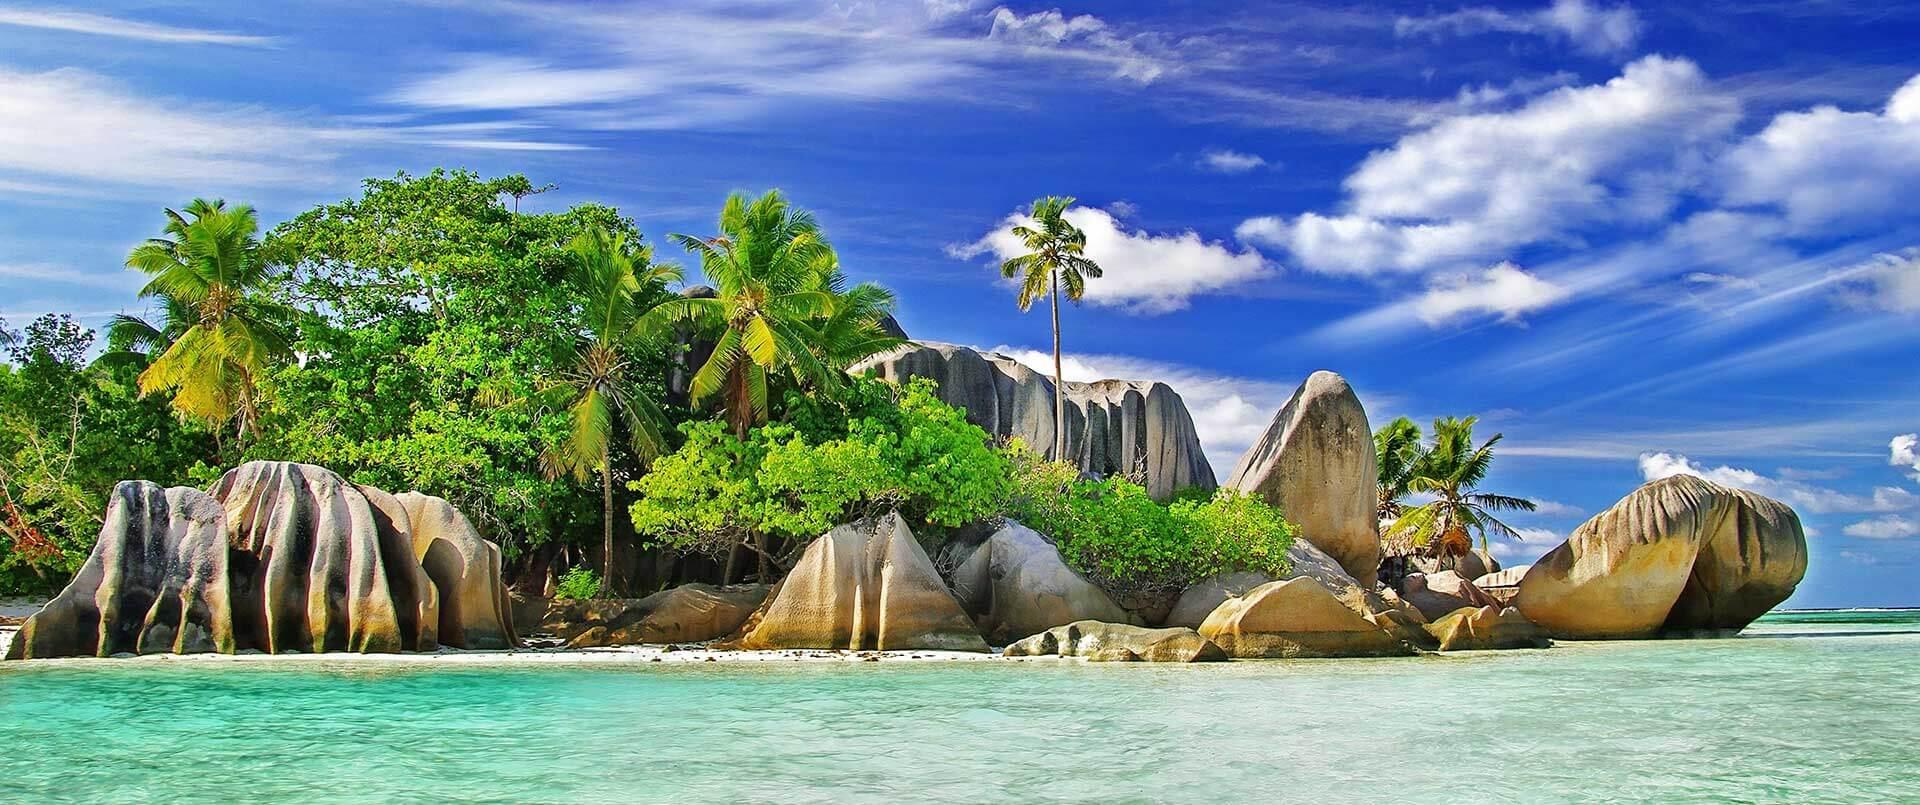 Kenya and the Seychelles